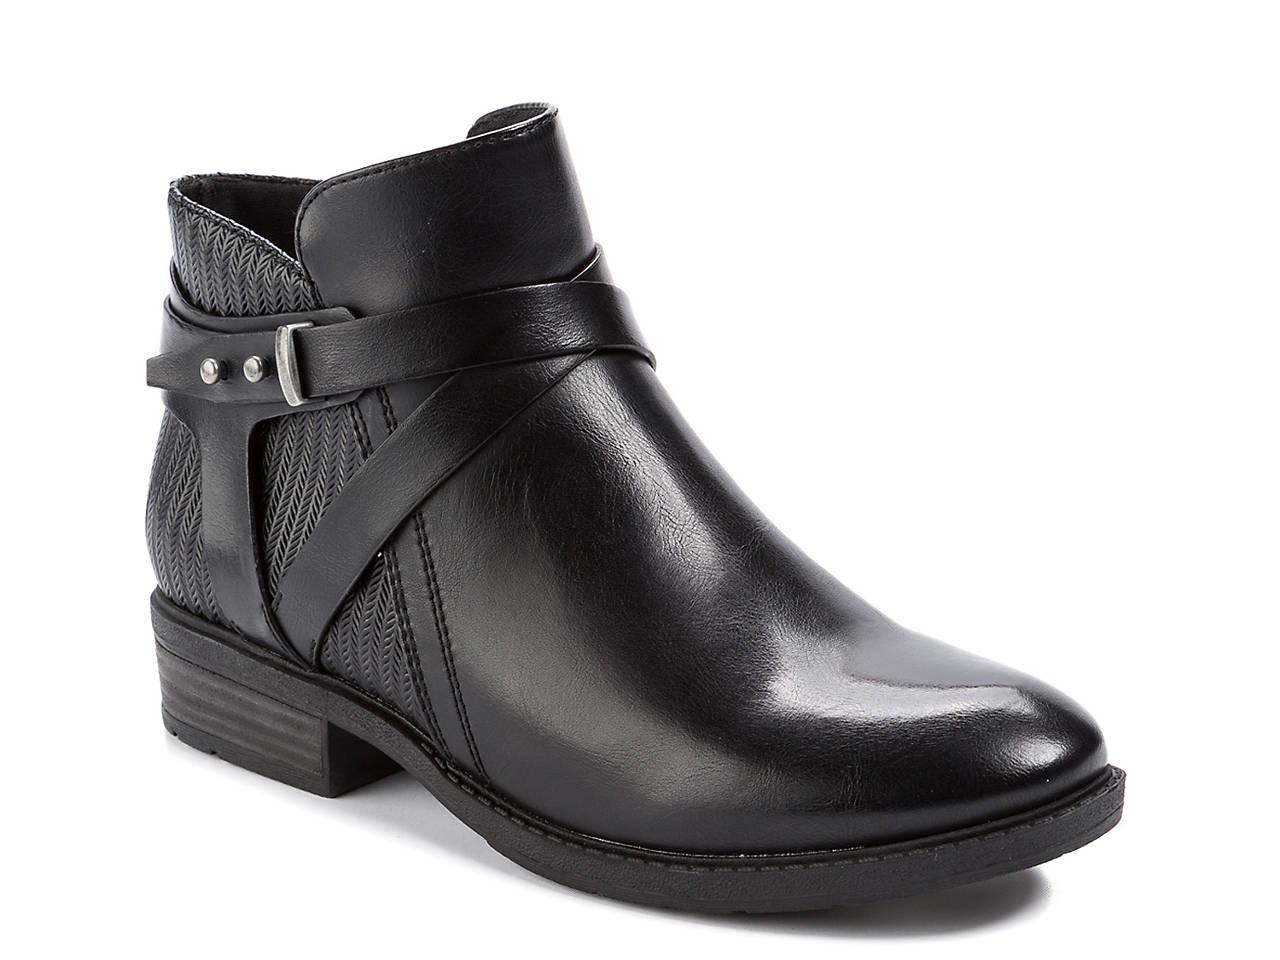 029ed946b0a Bare Traps Yadda Bootie Women s Shoes